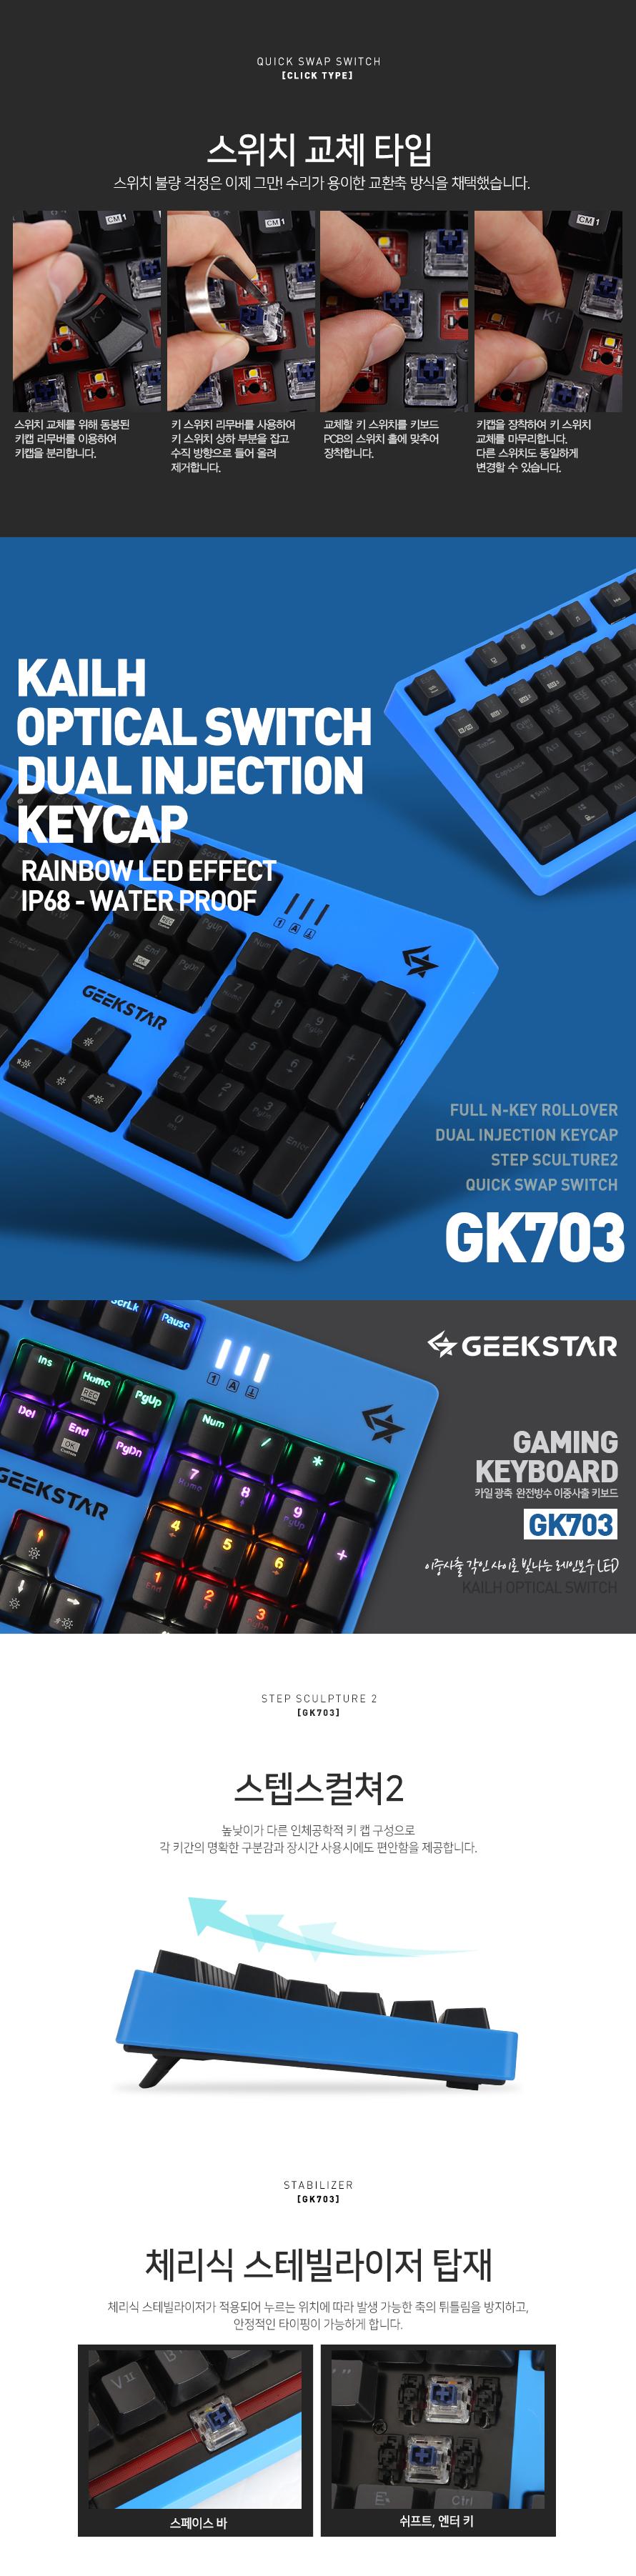 GK703_04